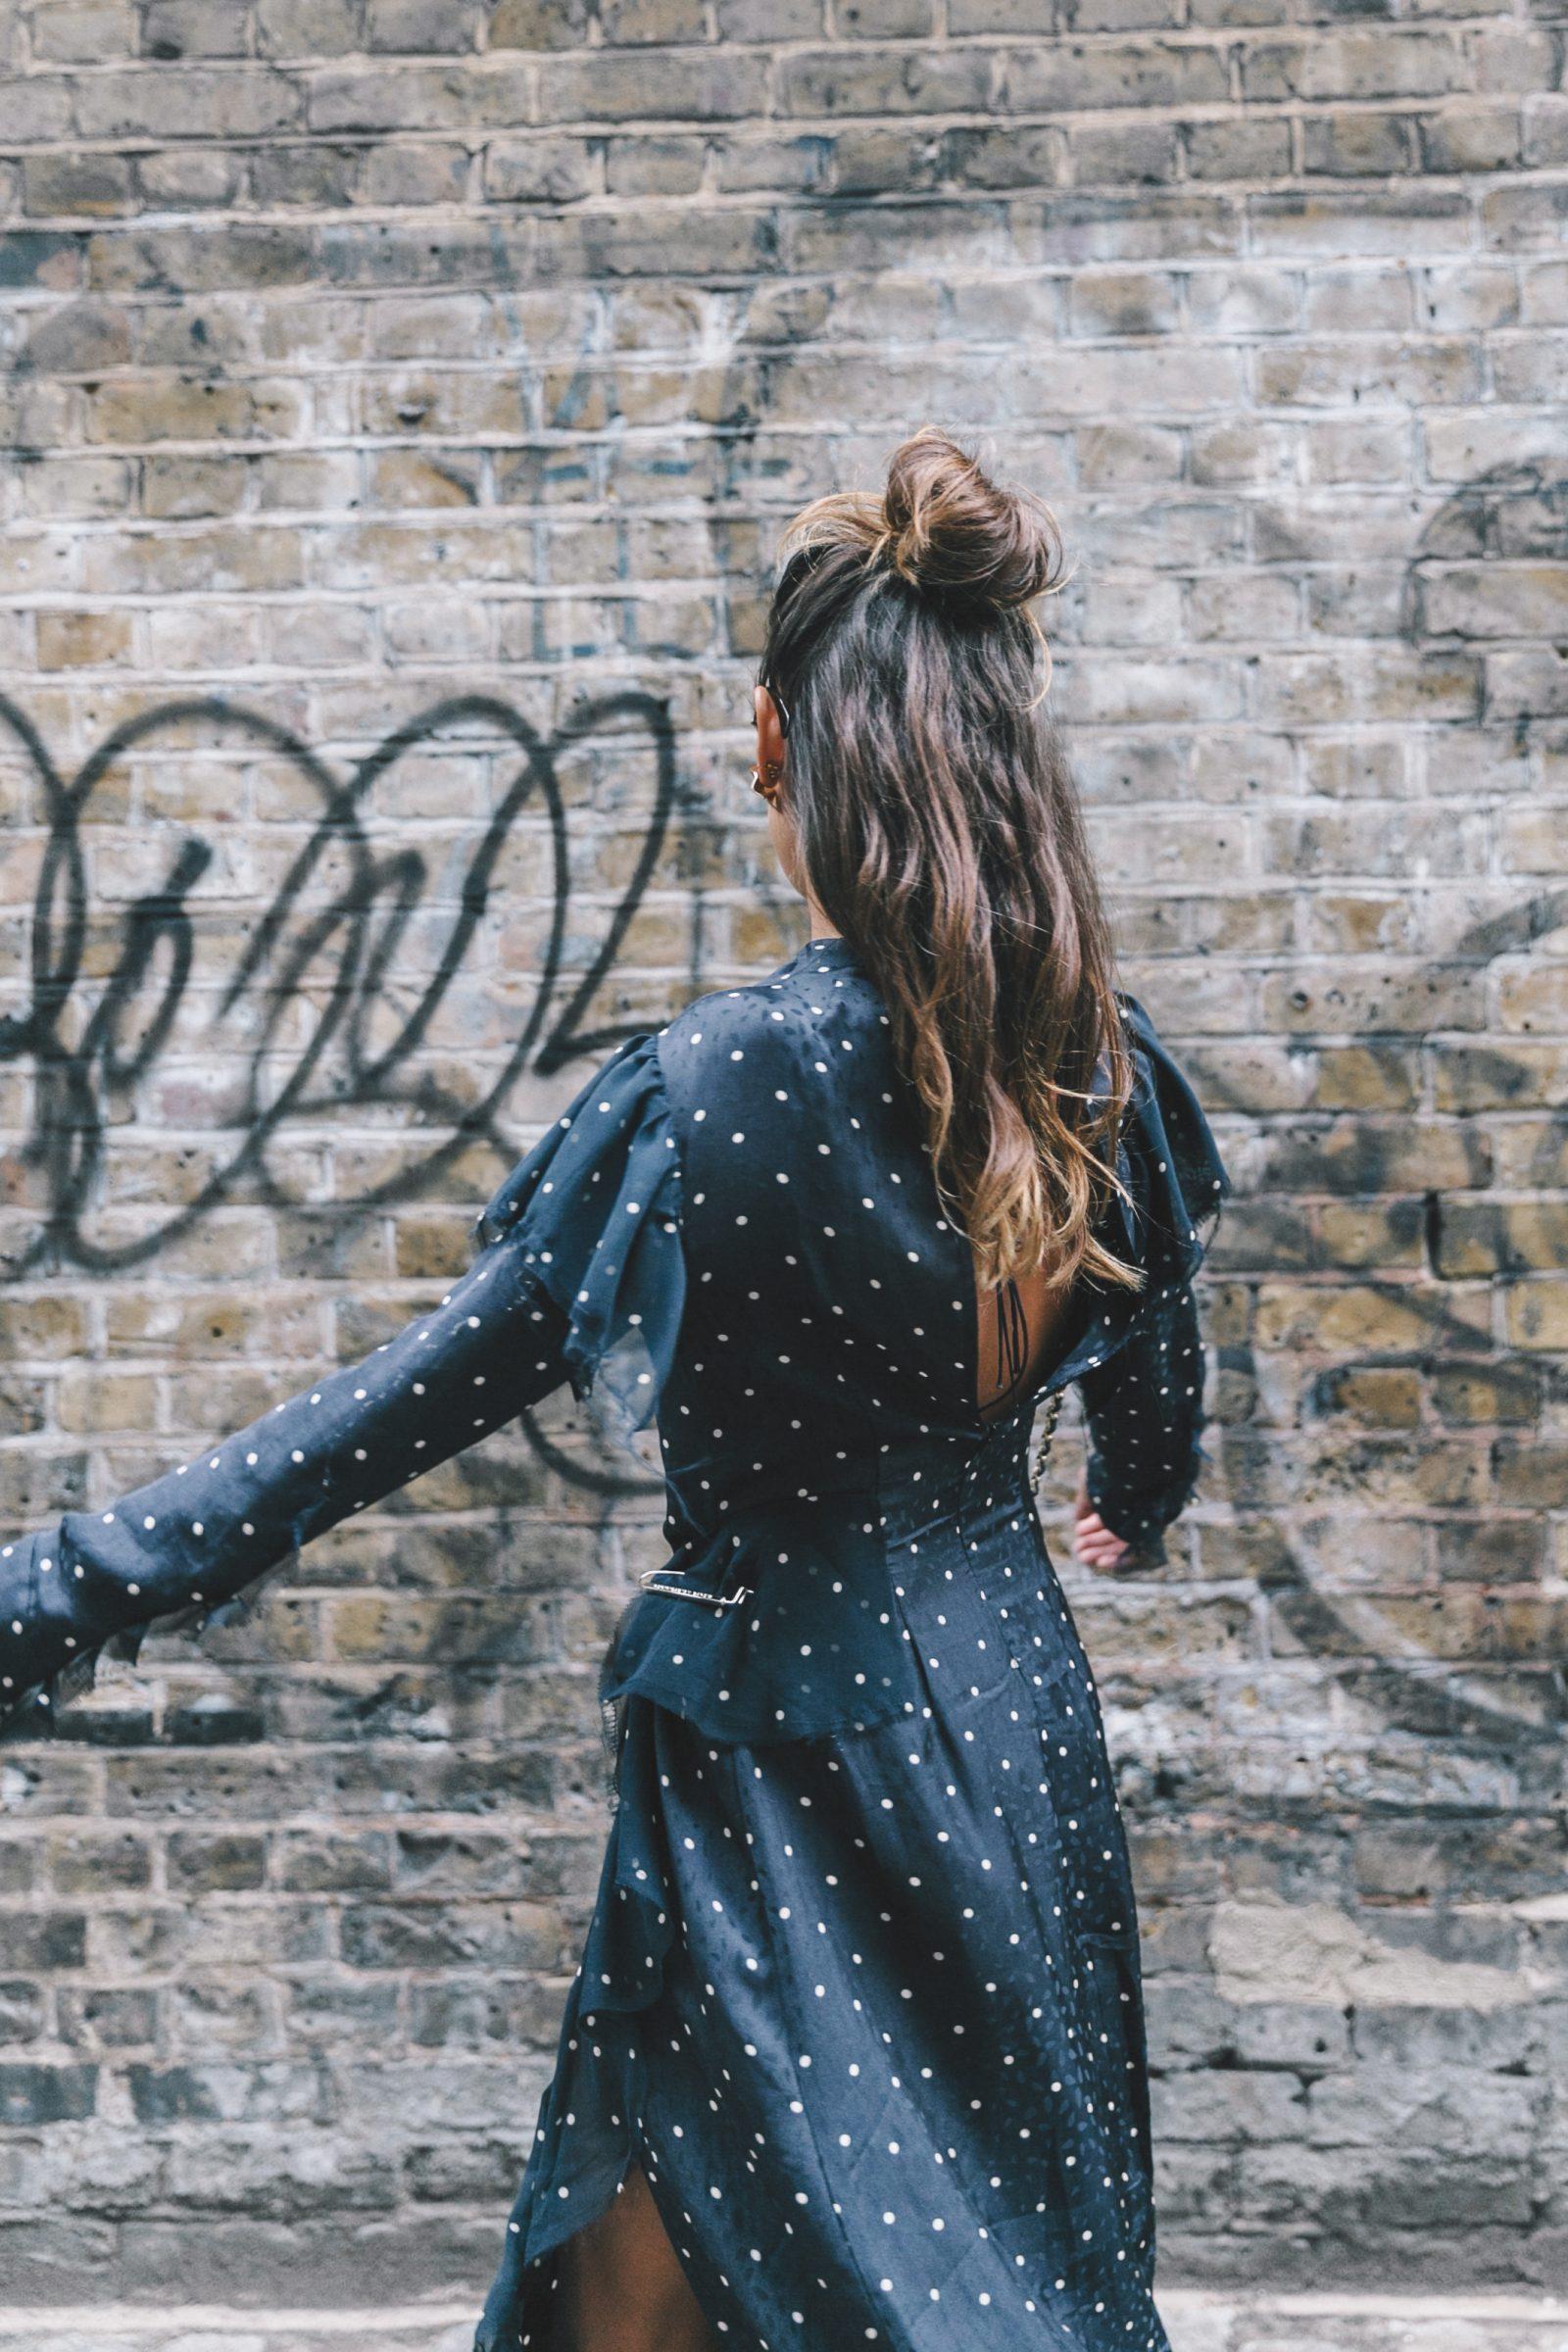 lfw-london_fashion_week_ss17-street_style-outfits-collage_vintage-vintage-topshop_unique-polka_dot_dress-white_mules-topshop_boutique-adenorah-4